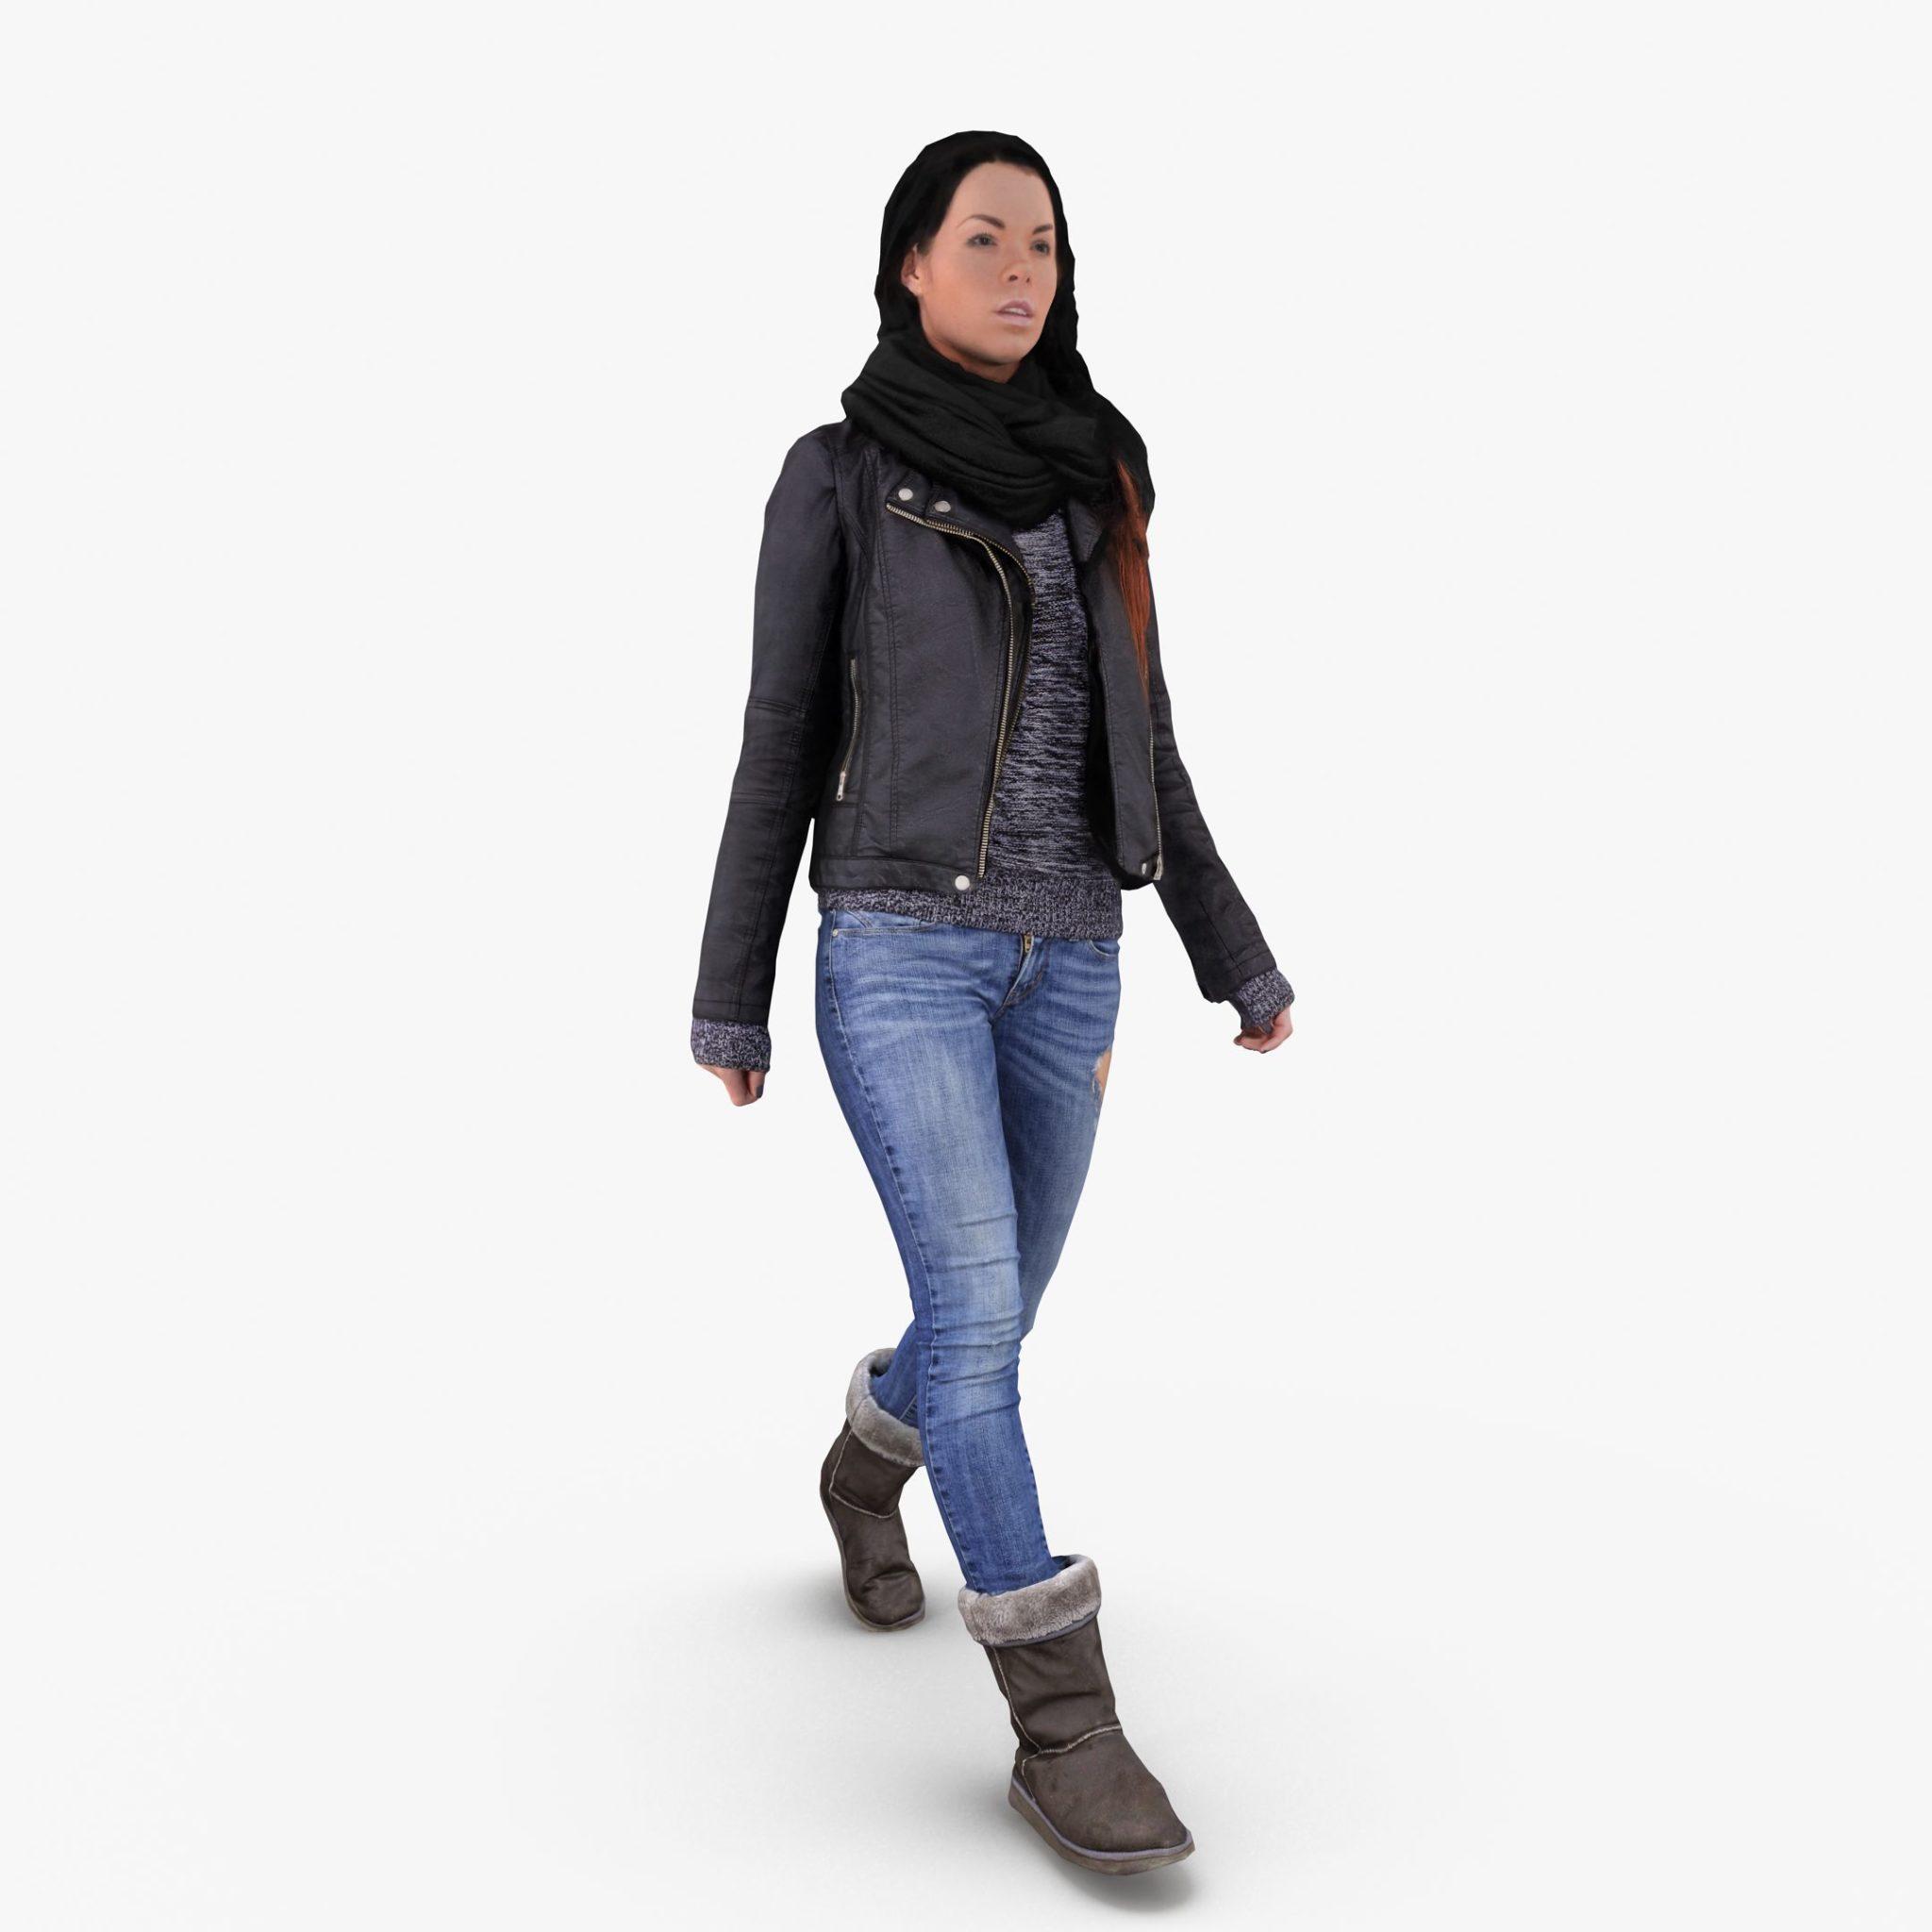 Casual Woman Winter Dress 3D Model | 3DTree Scanning Studio